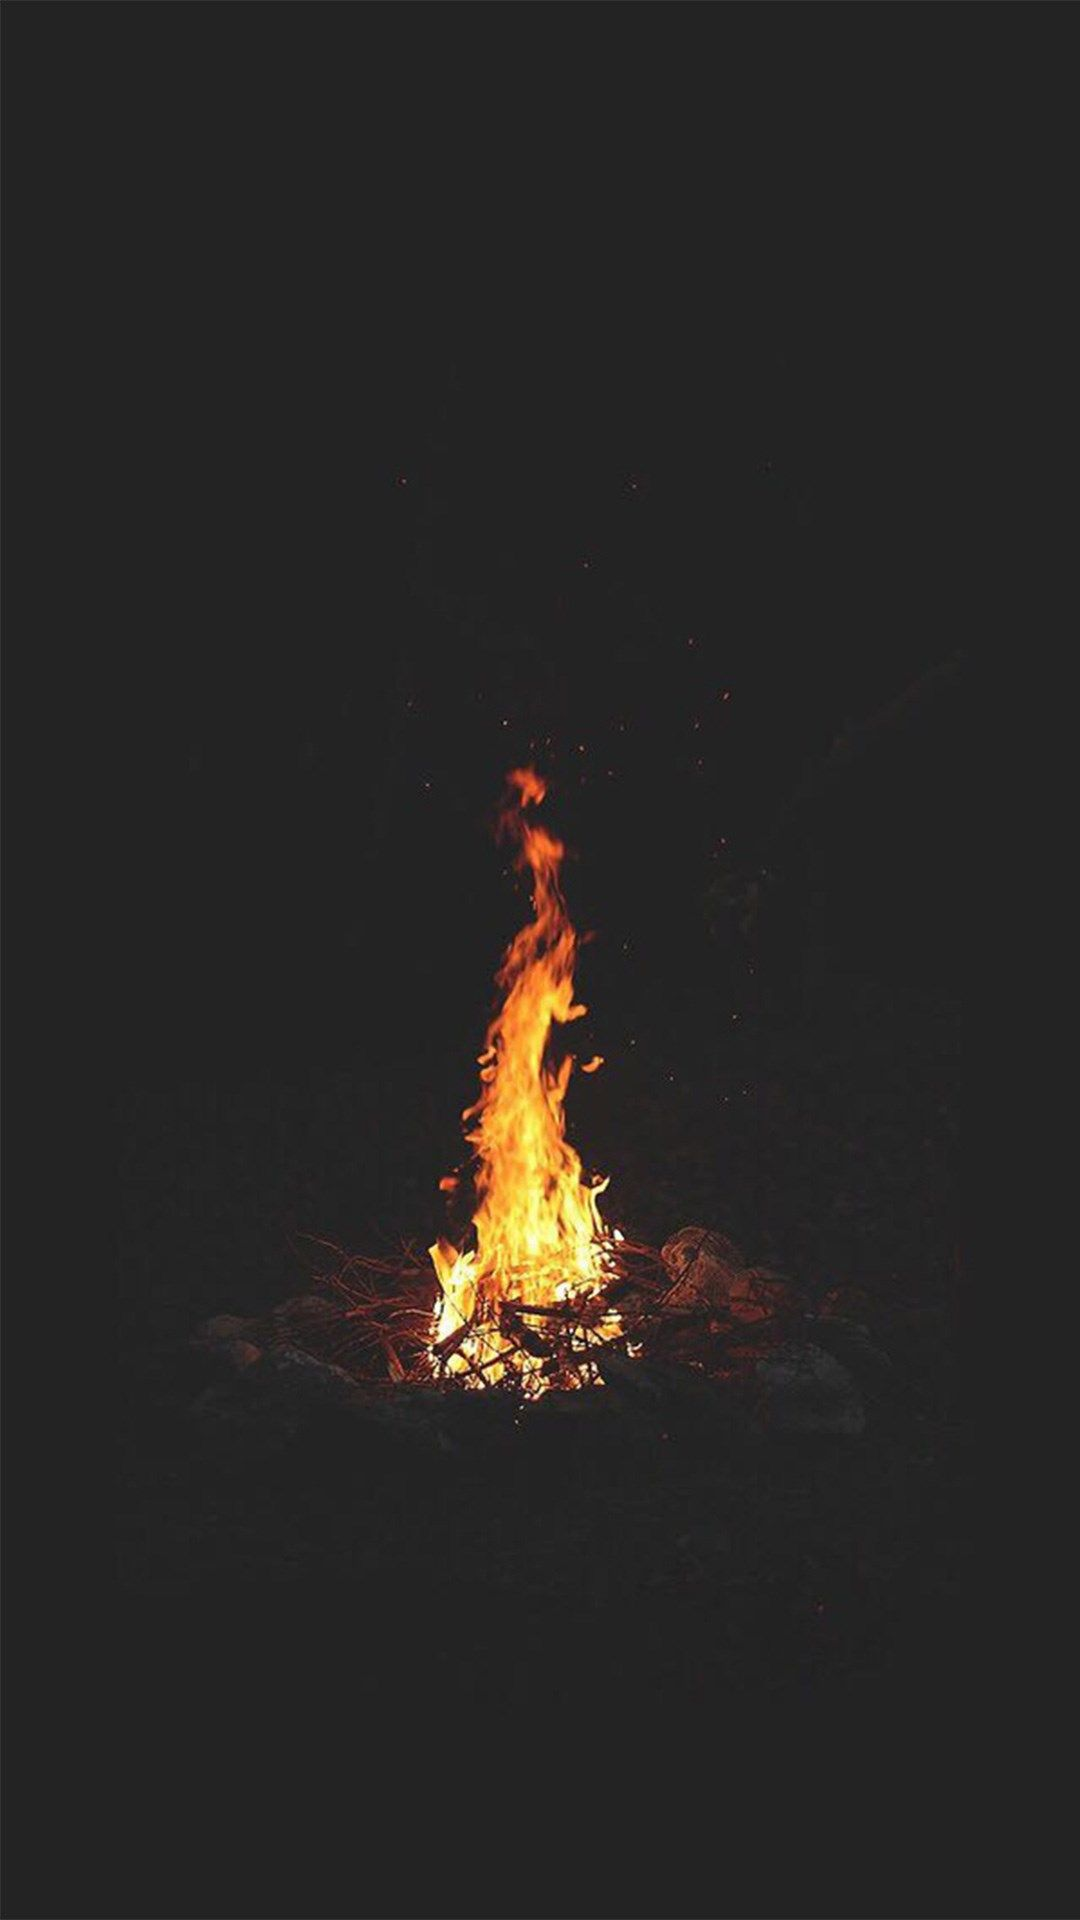 Dark Night Campfire Shiny Sky View Iphone 6 Wallpaper Iphone Wallpaper Vintage Iphone 6 Wallpaper Iphone Wallpaper Tumblr Aesthetic